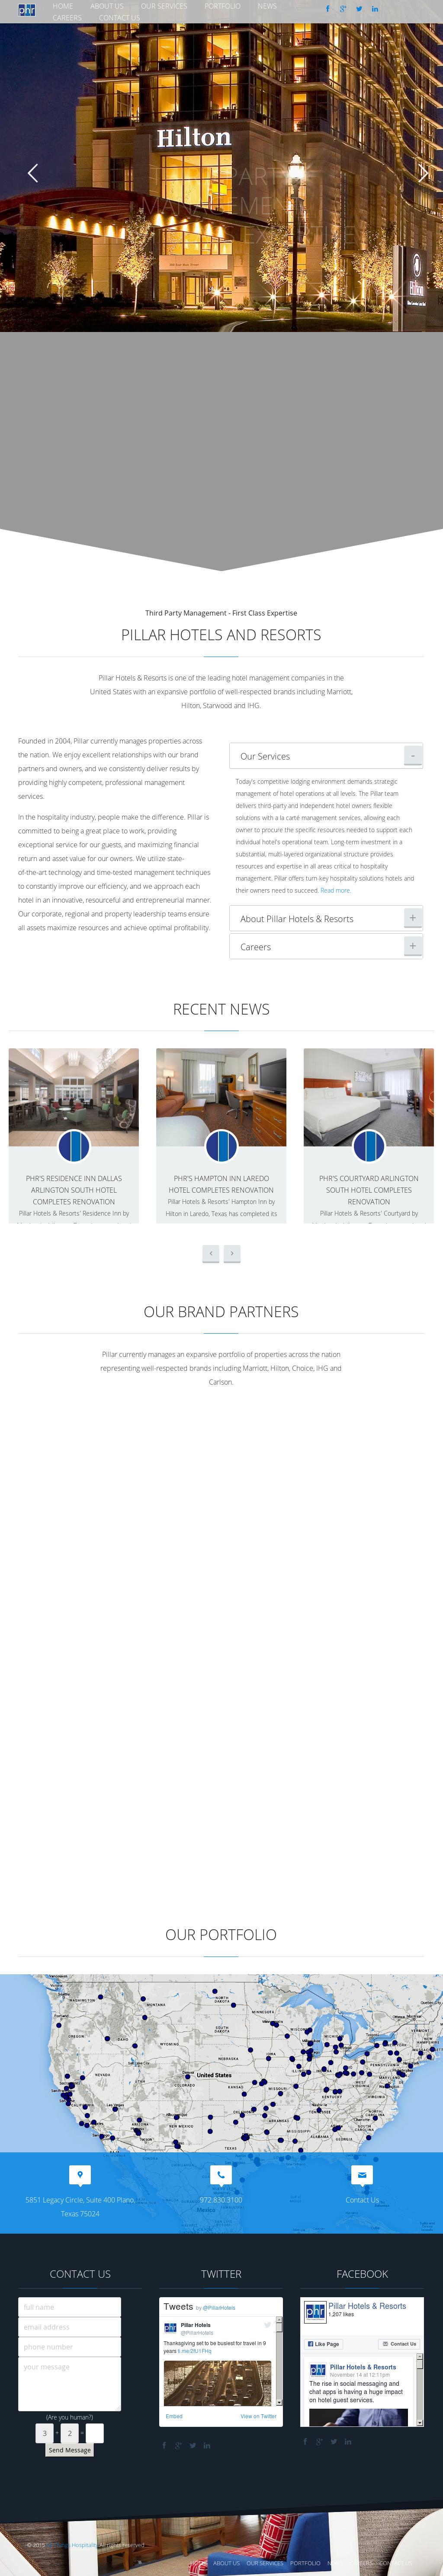 Pillar Hotels And Resorts Website History